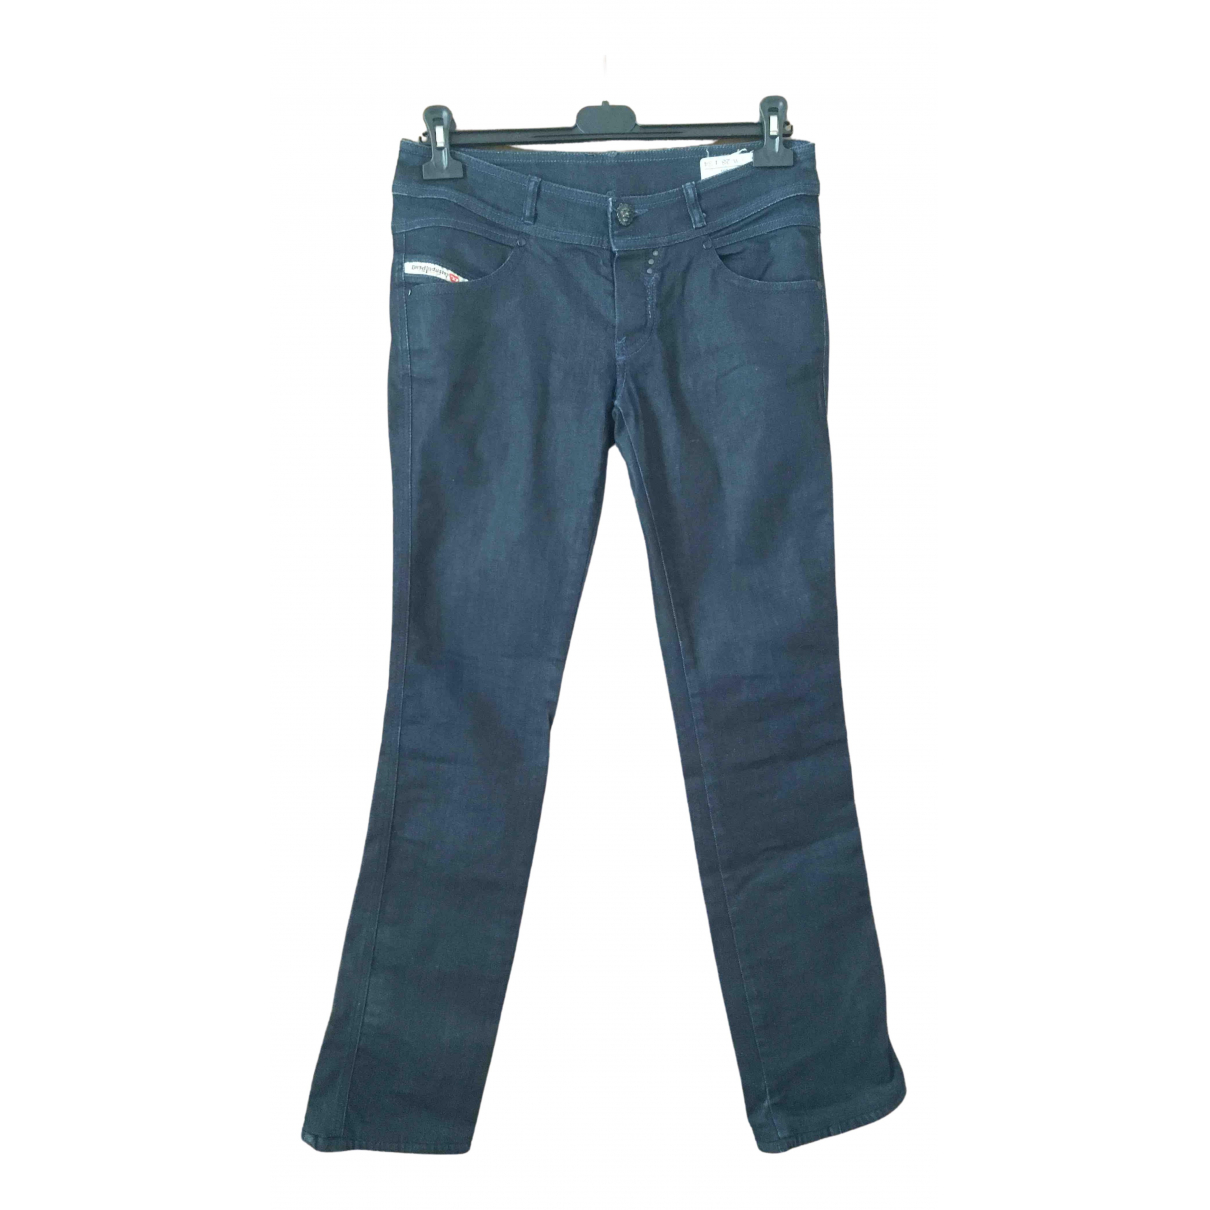 Diesel \N Blue Denim - Jeans Jeans for Women 28 US